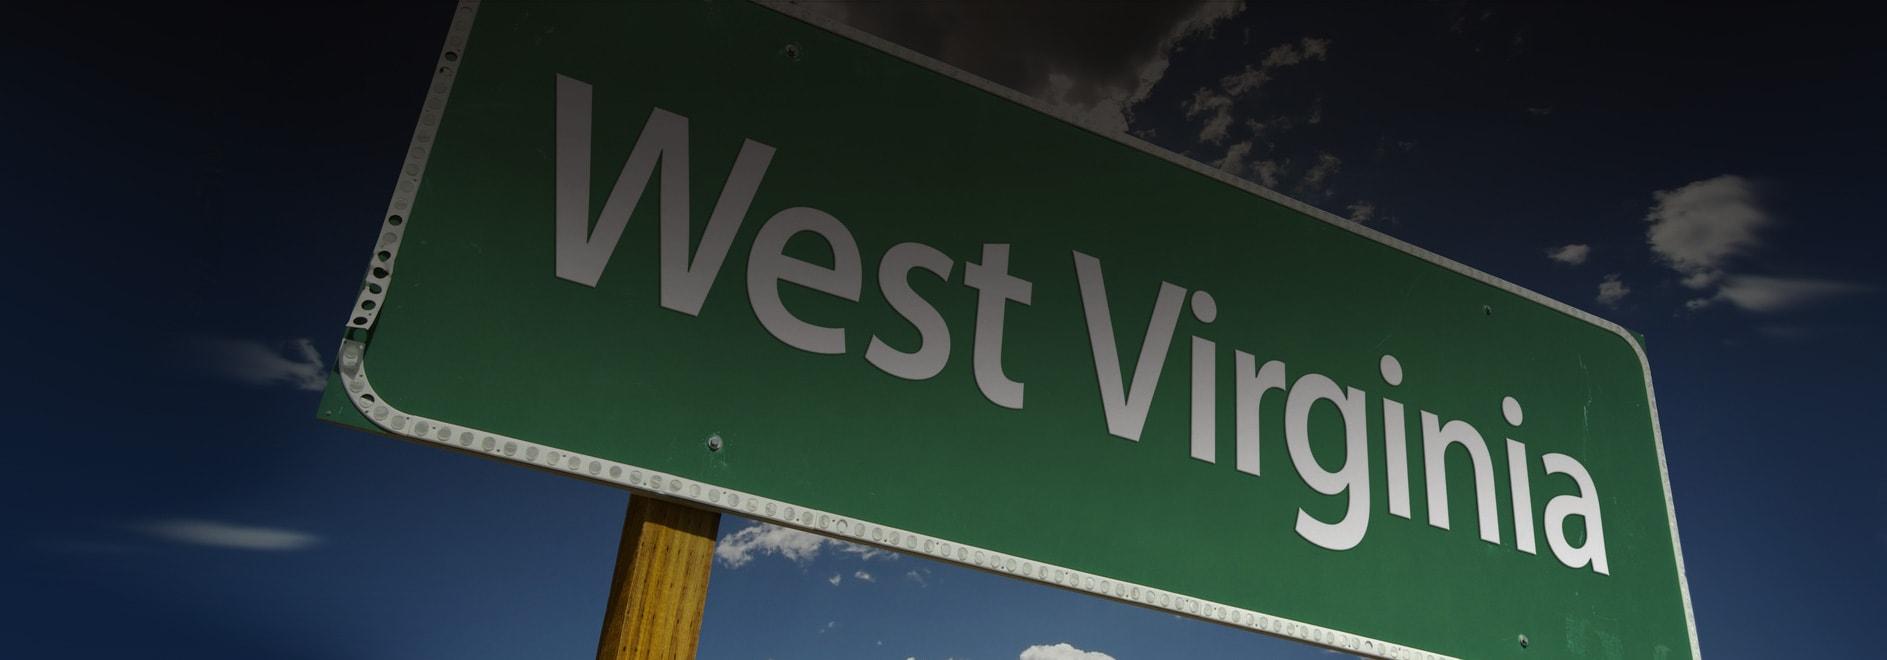 Web Design Beckley West Virginia